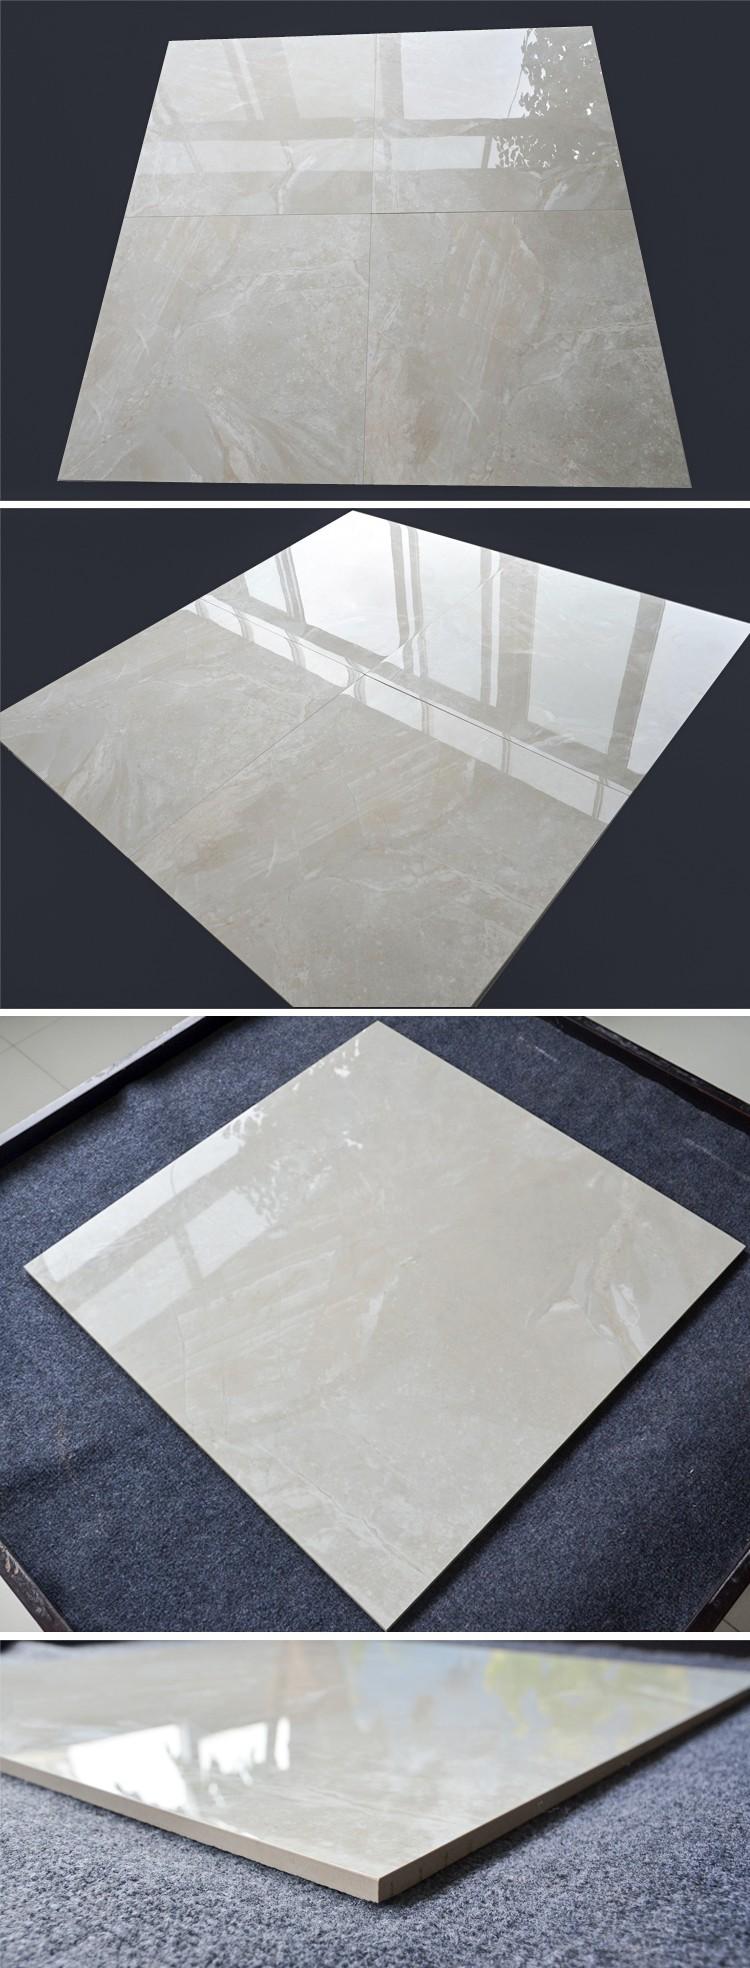 Foshan Glazed Ceramic Tile 600x600 Hot Sales Cheap Ceramic